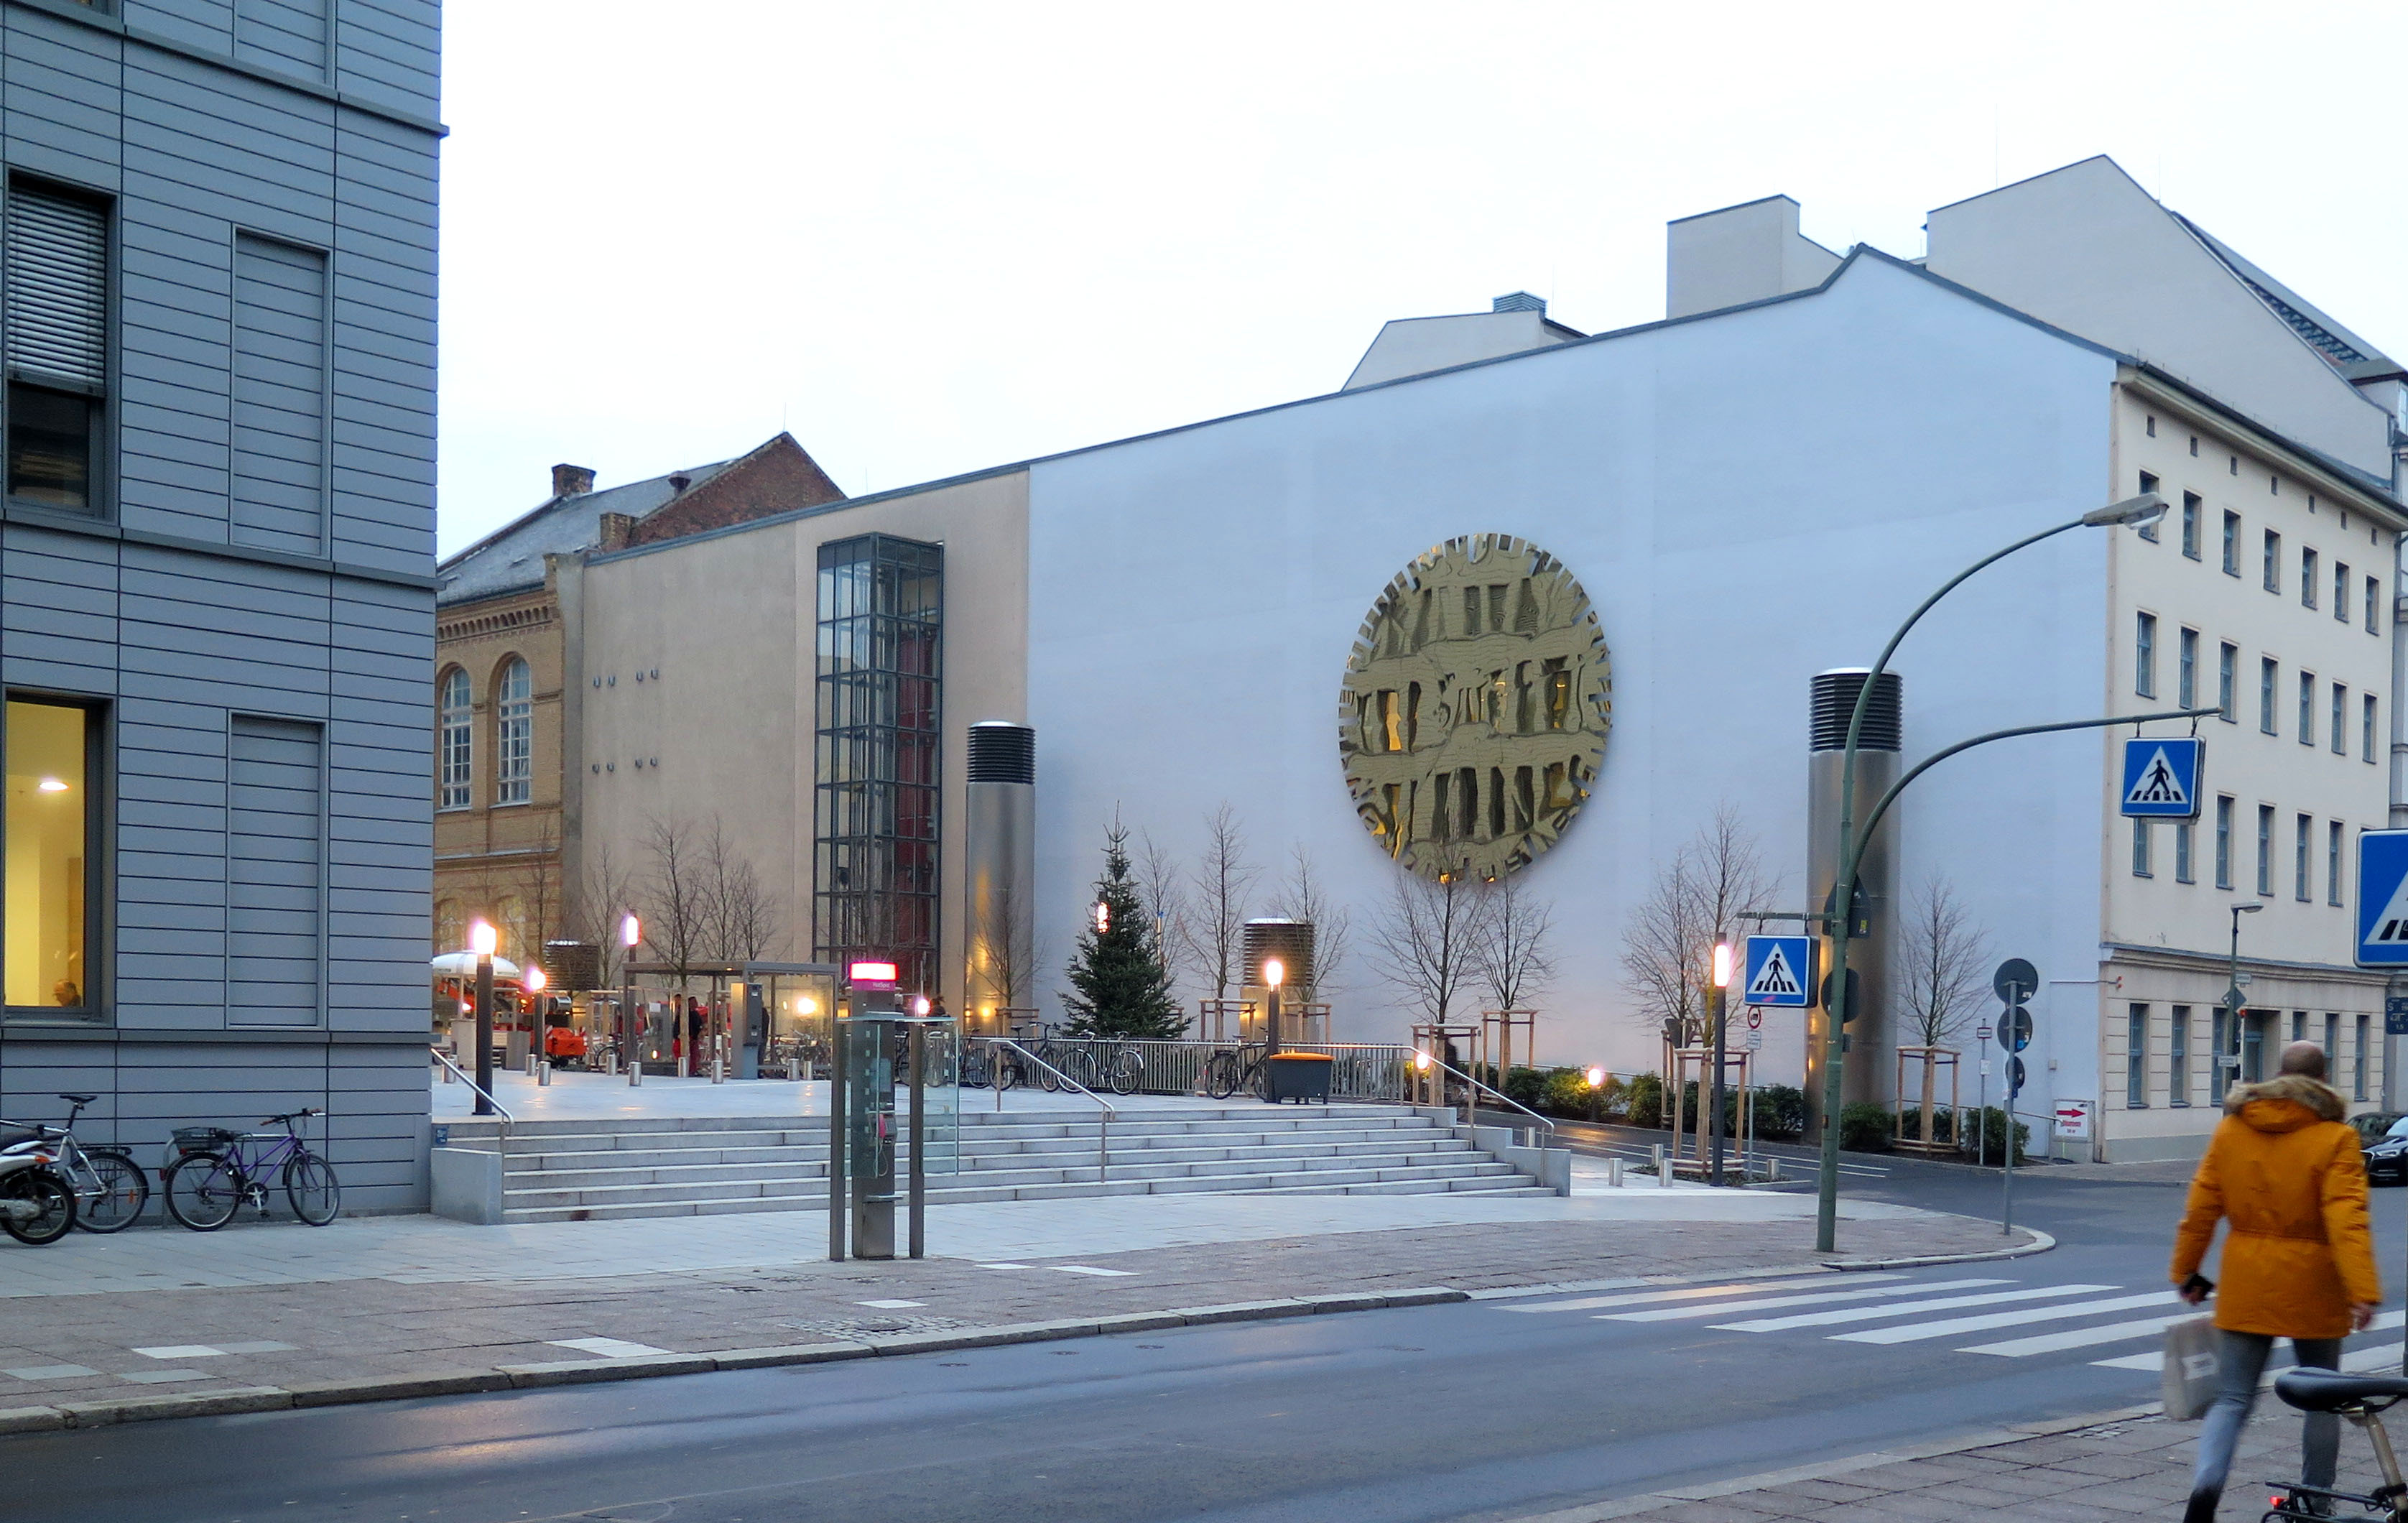 Goldene Stunde Plastik Berlin Charite imagine structure Tragwerksplanung